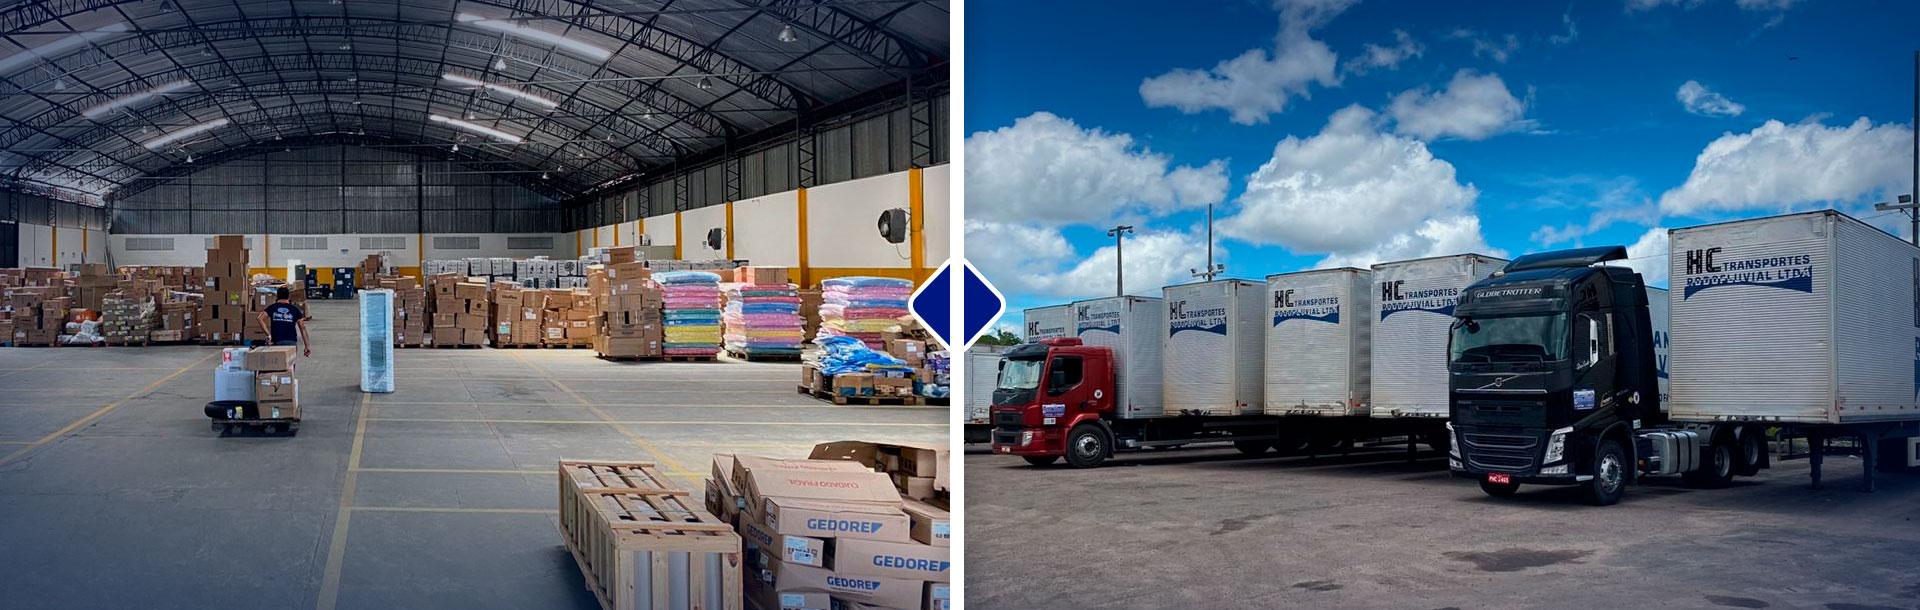 HC Transportes Manaus